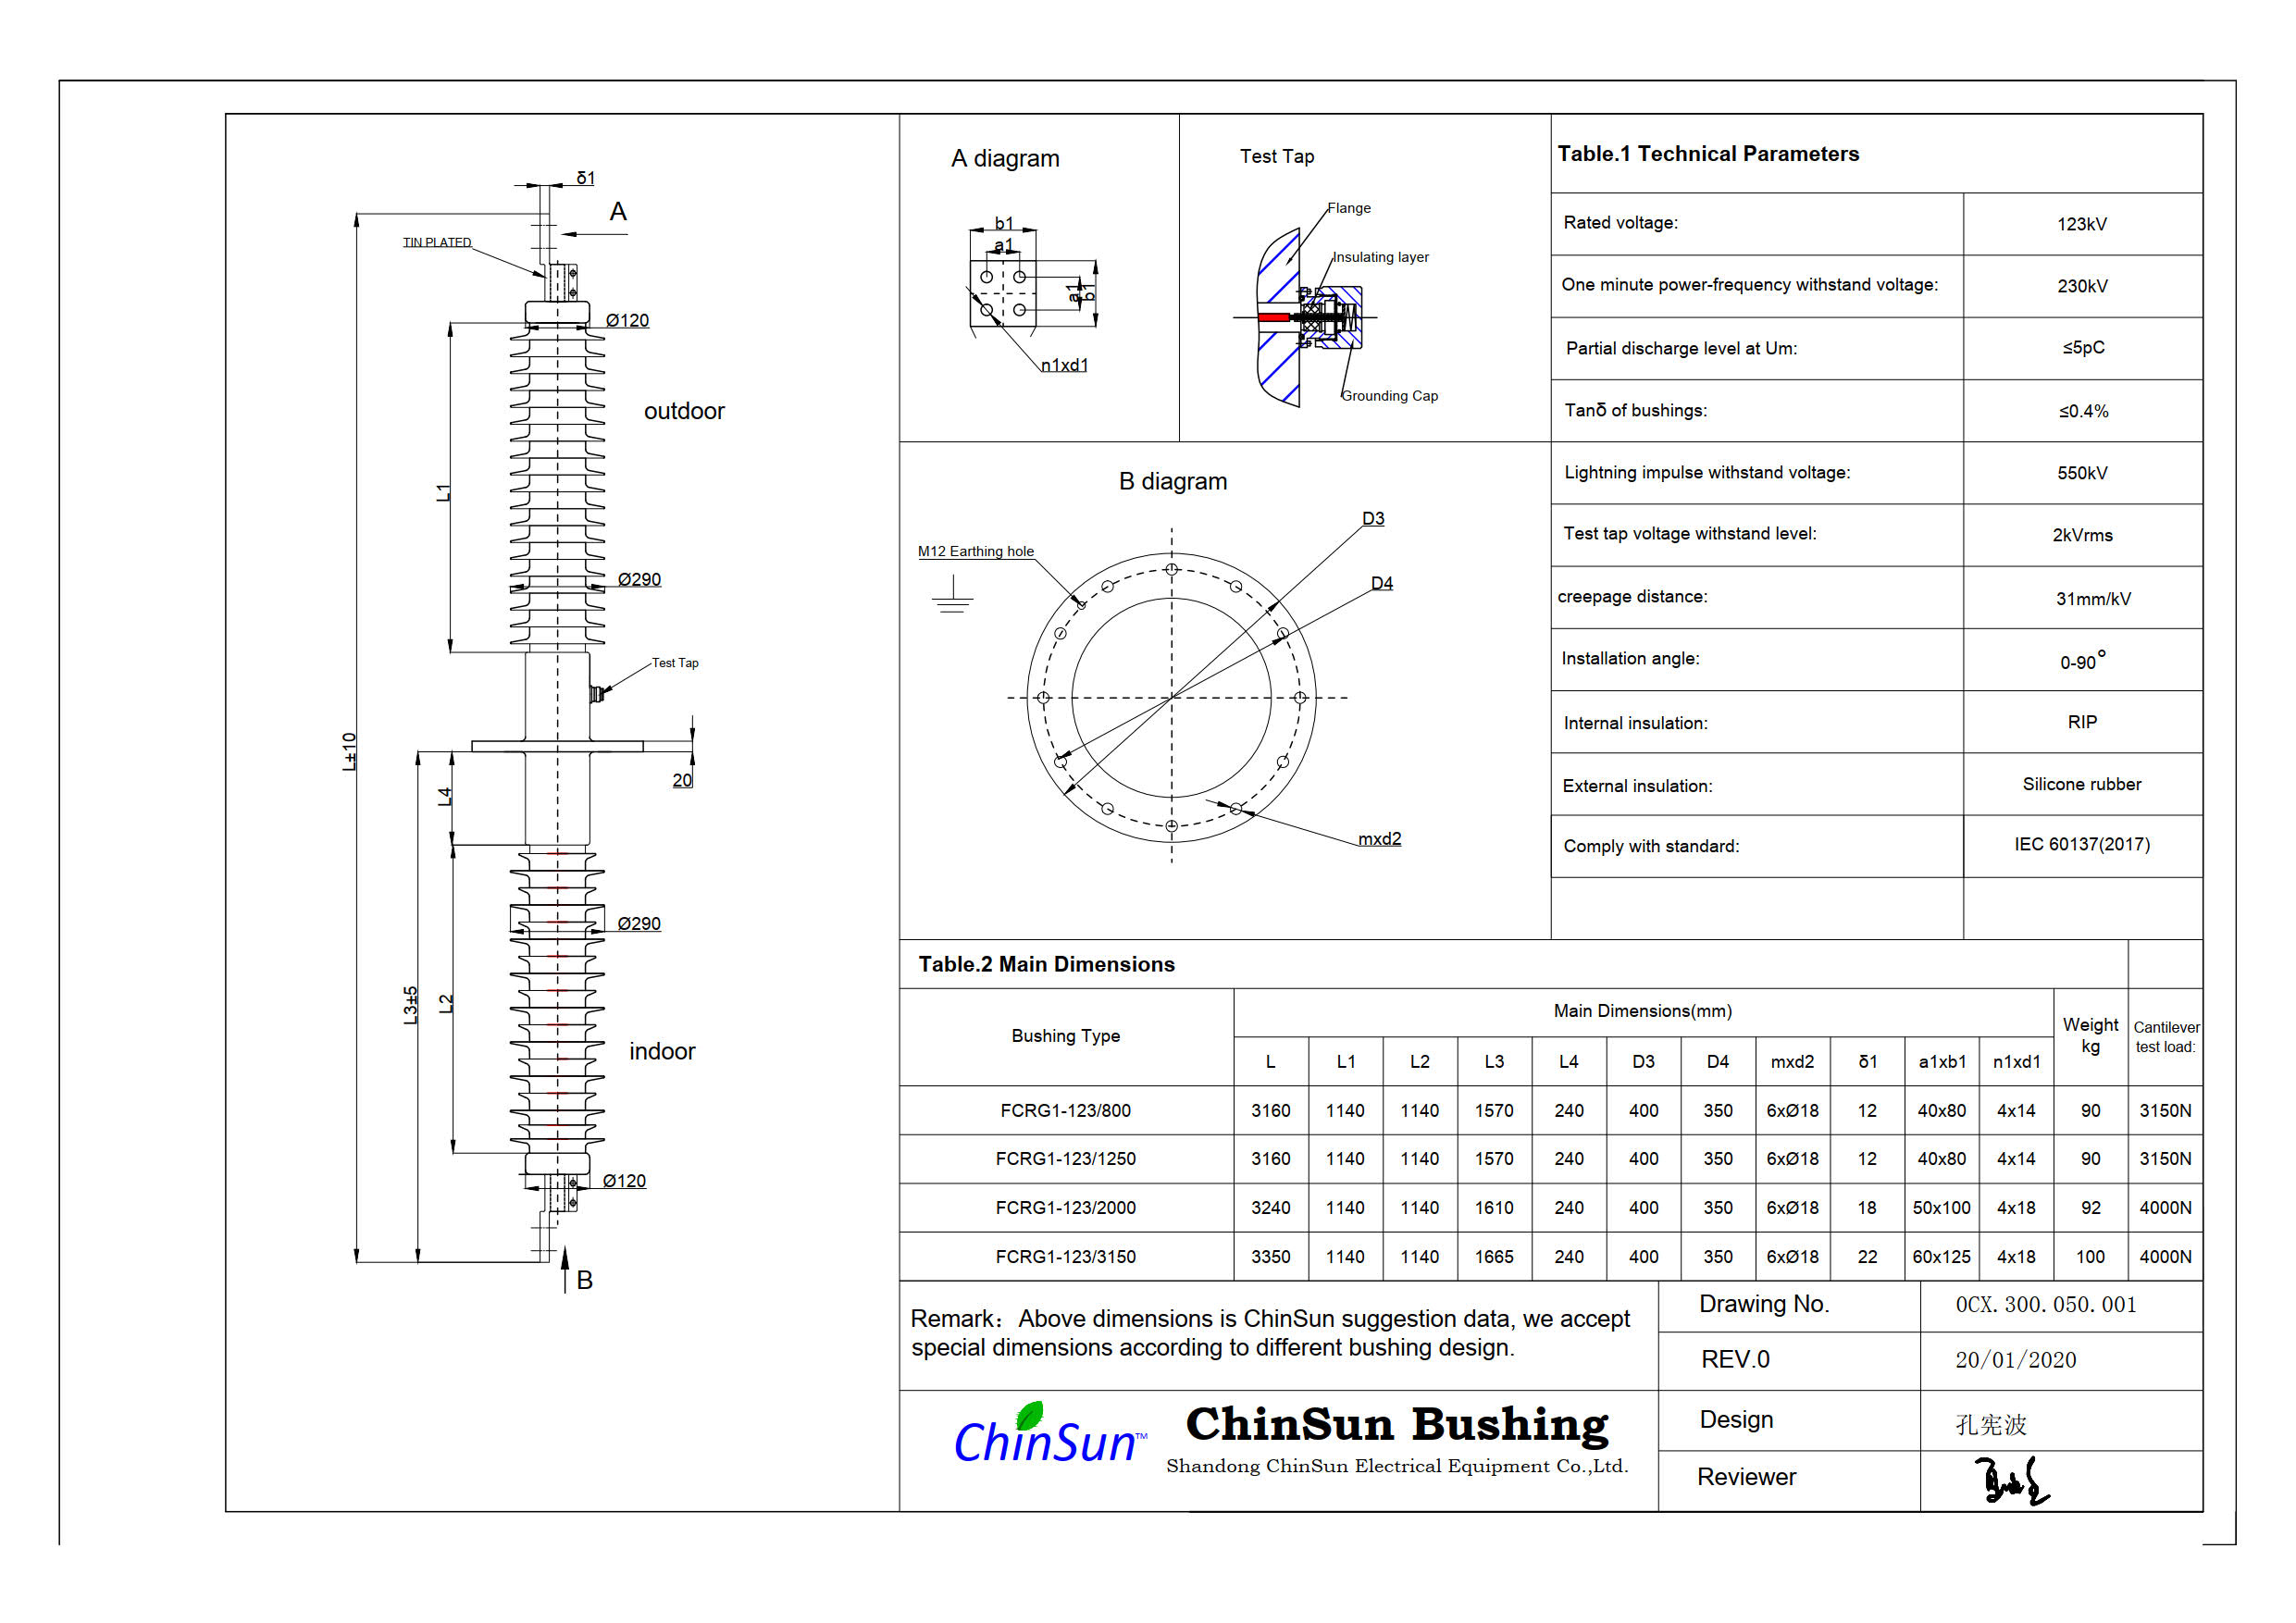 Drawing-wall bushing-123kV silicone rubber-ChinSun